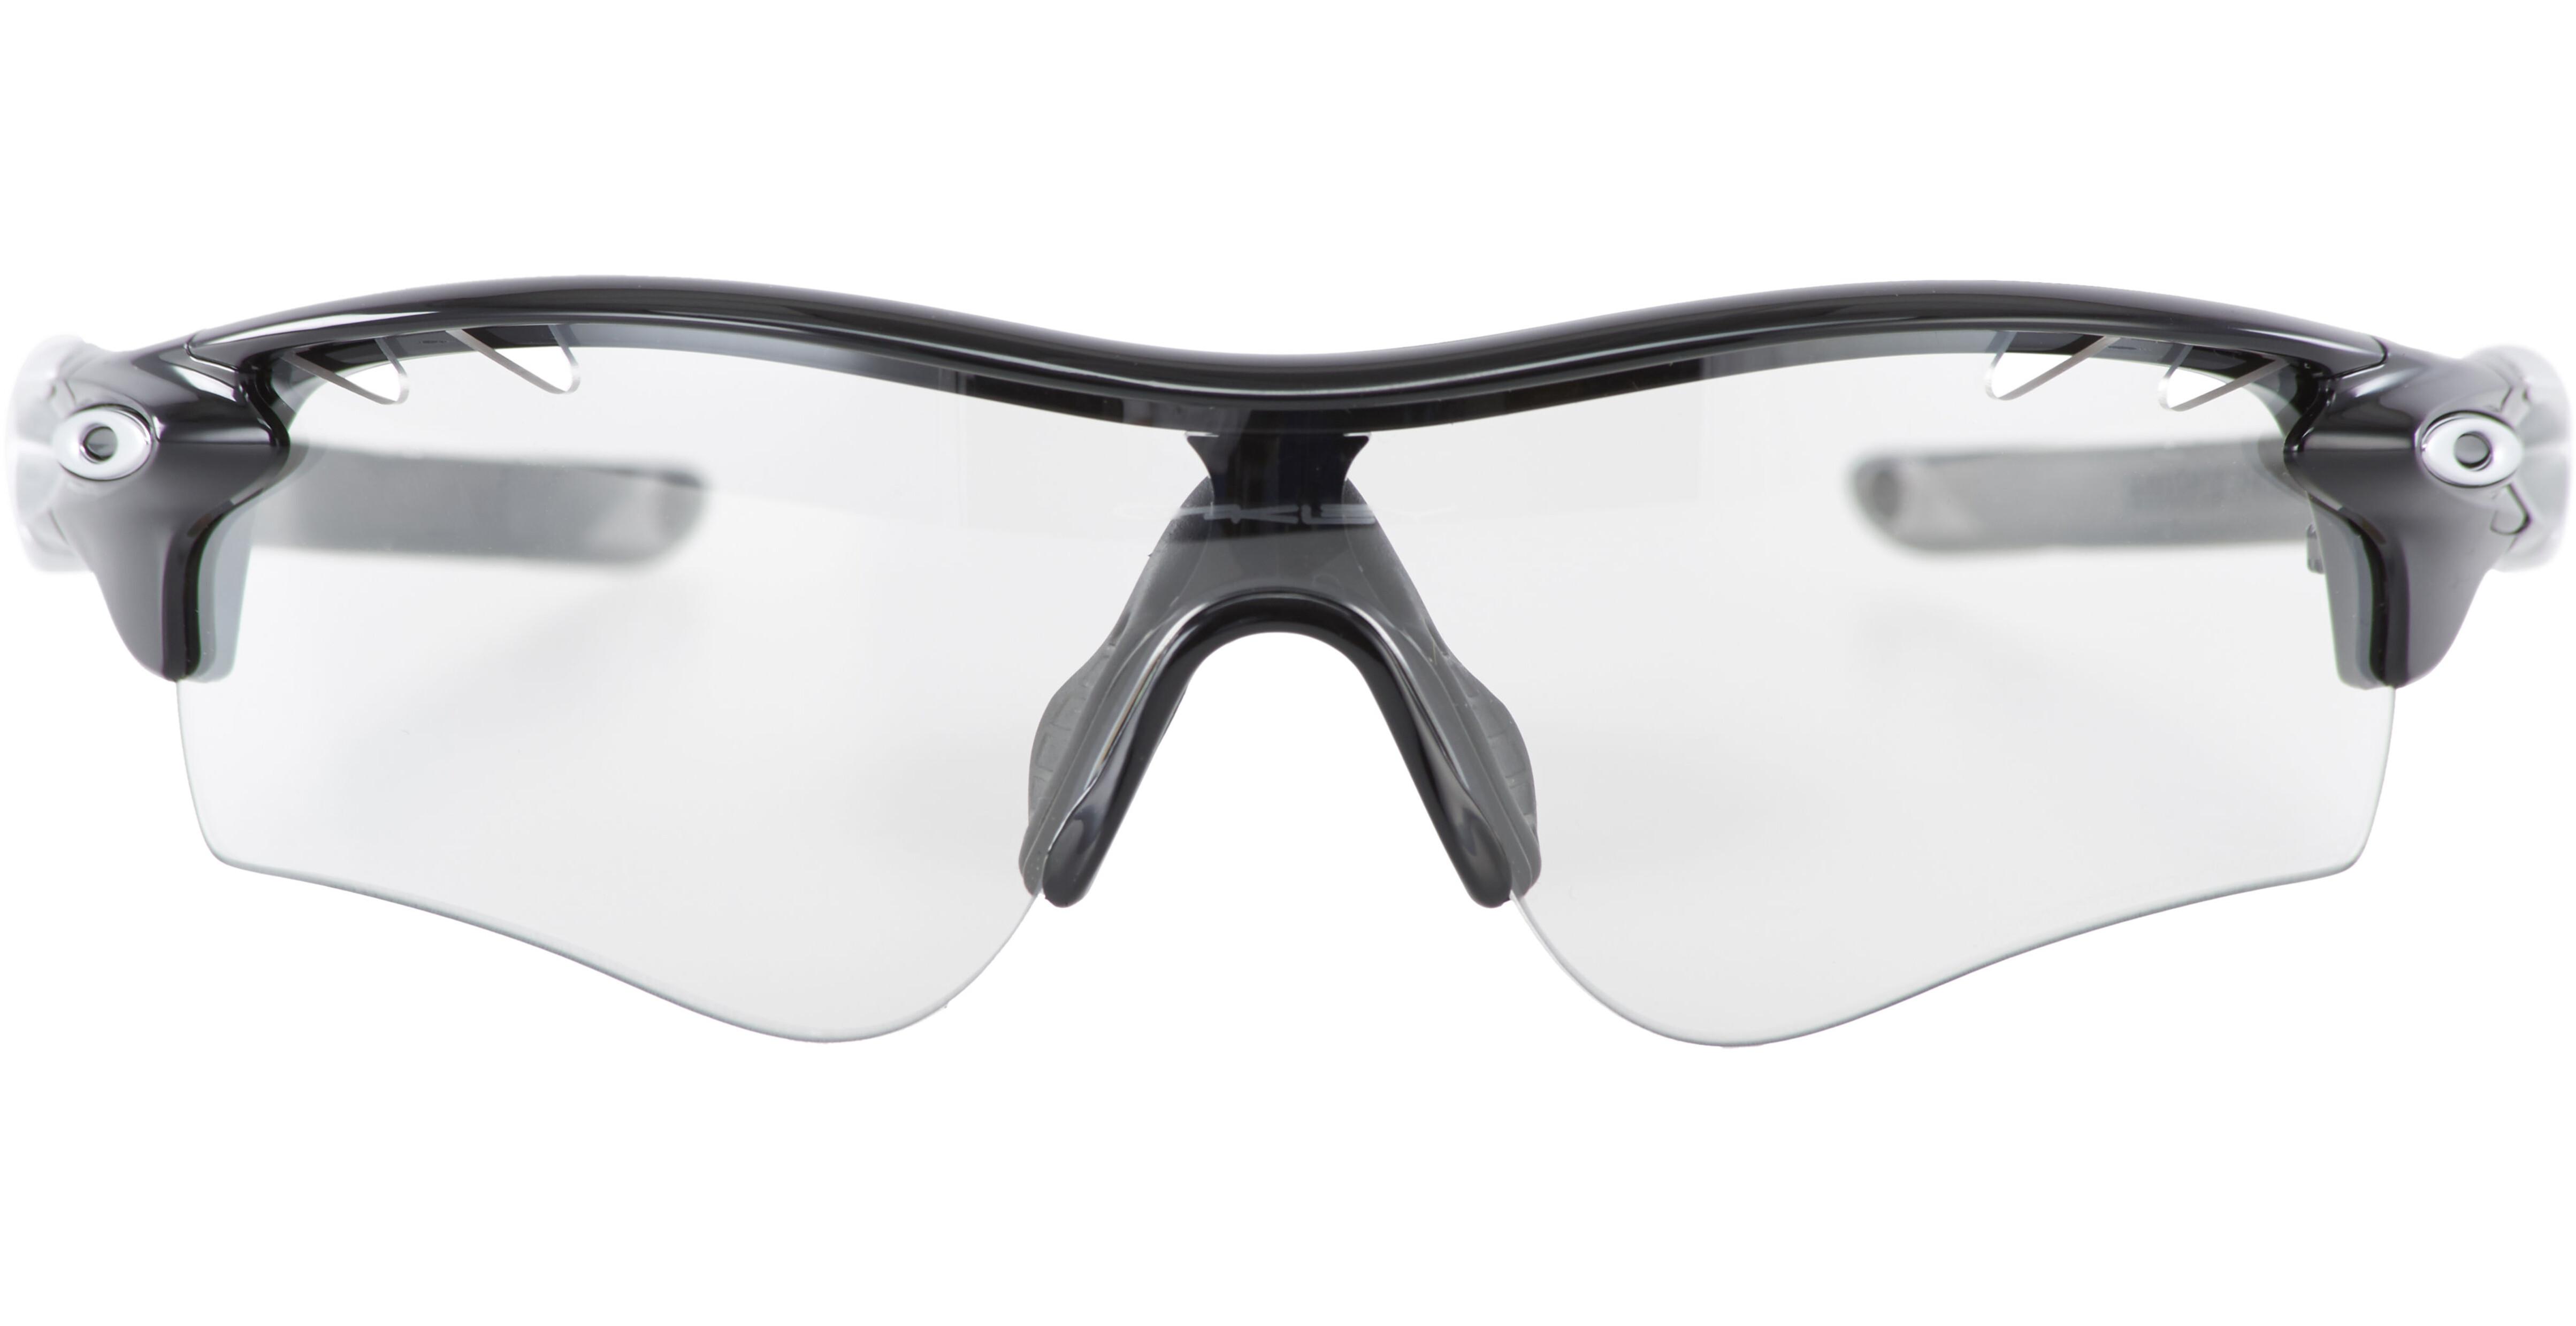 94b5c6f075 Oakley Radarlock Path - Gafas ciclismo Hombre - negro | Bikester.es